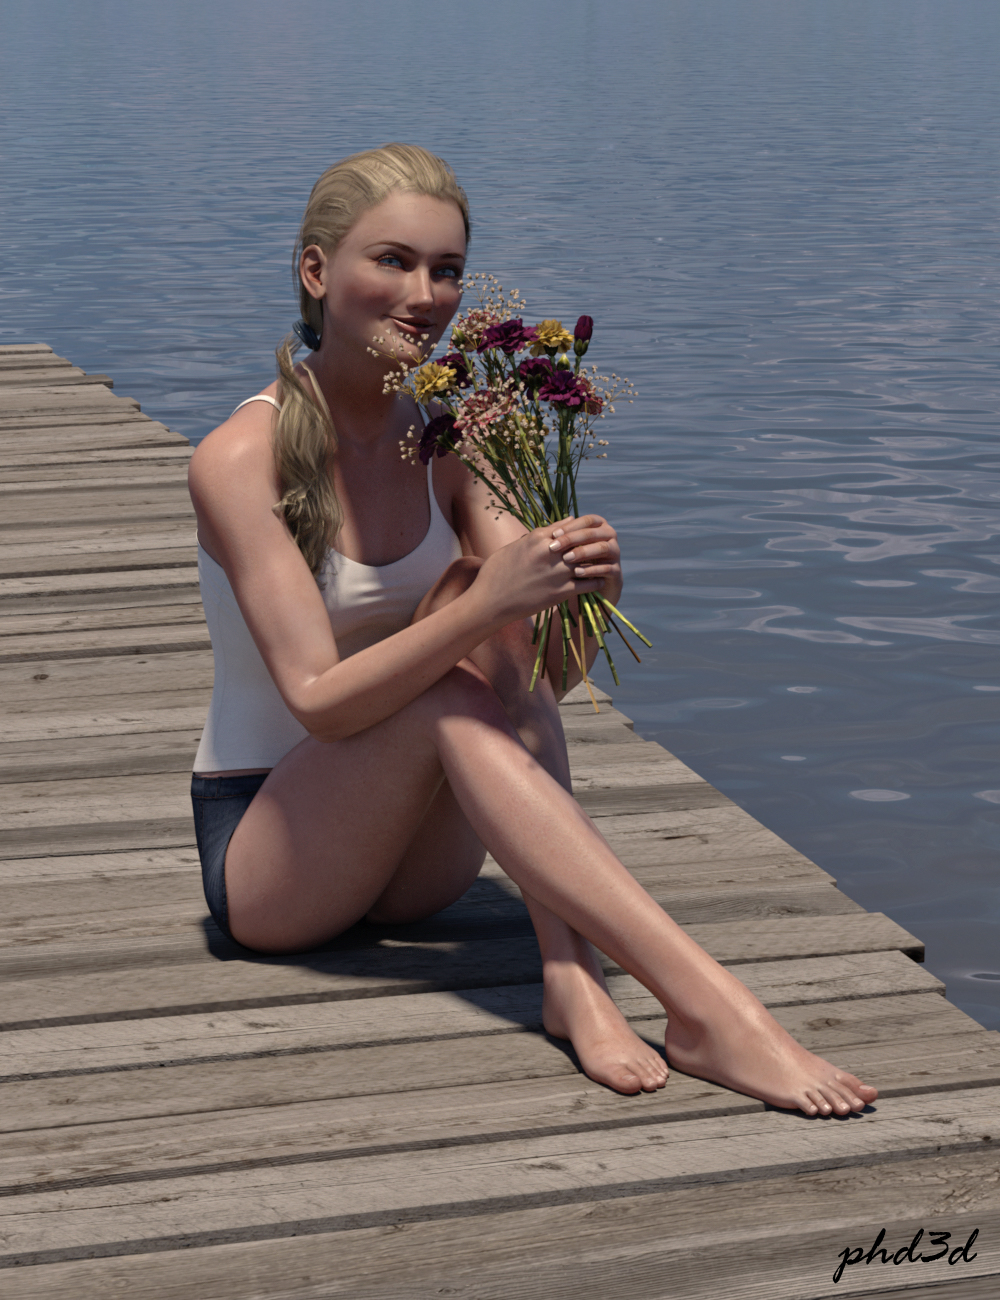 Girls with carnations v2_phd3d.jpg